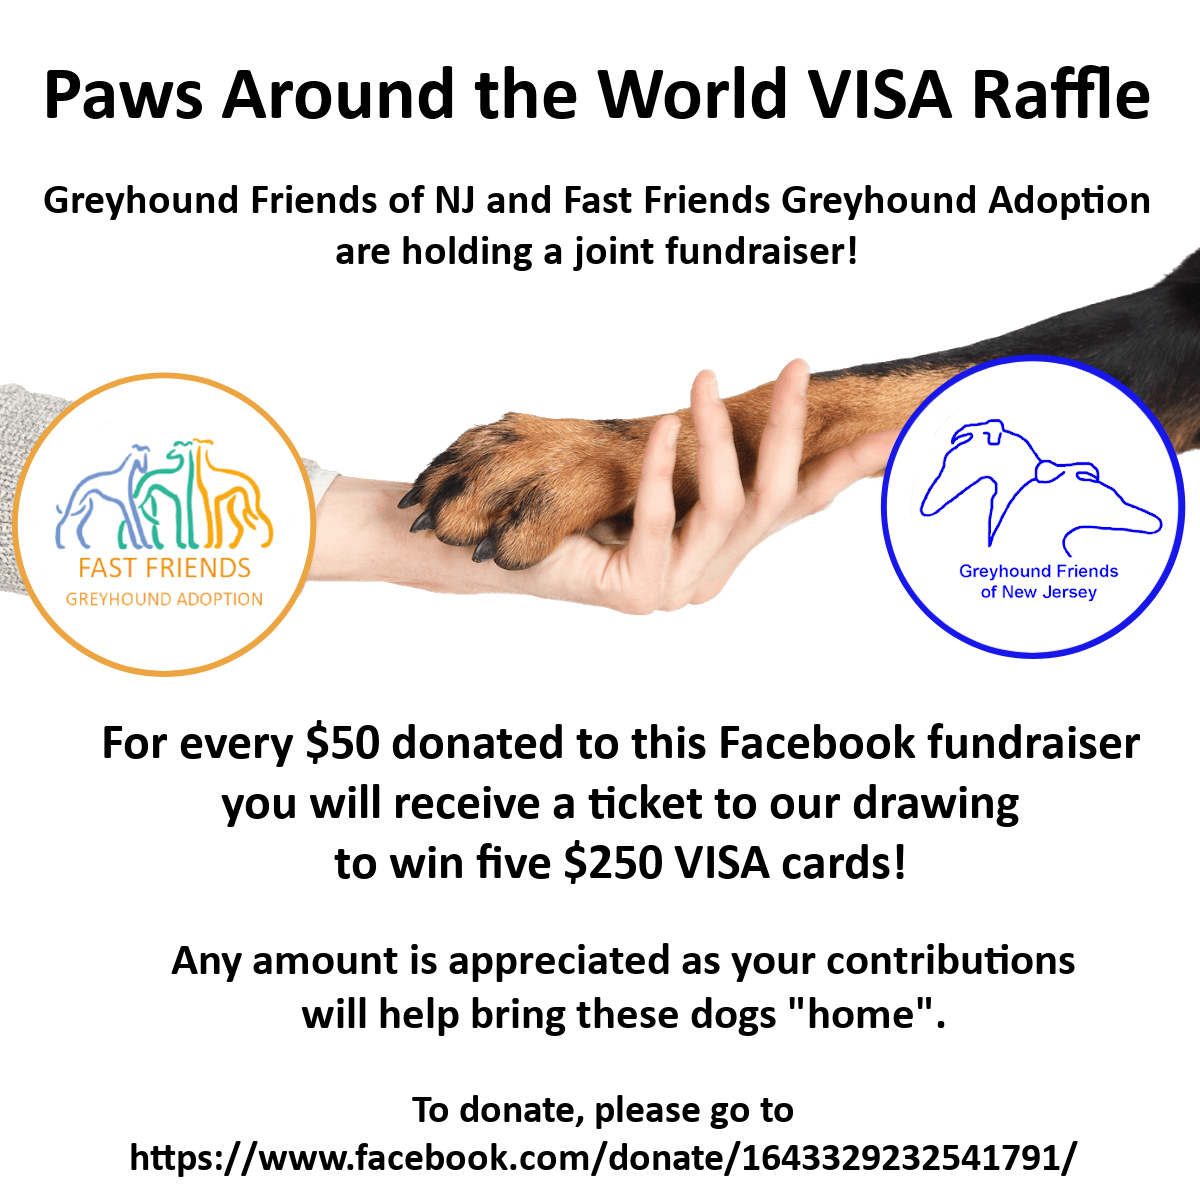 Paws Around the World VISA Raffle 1